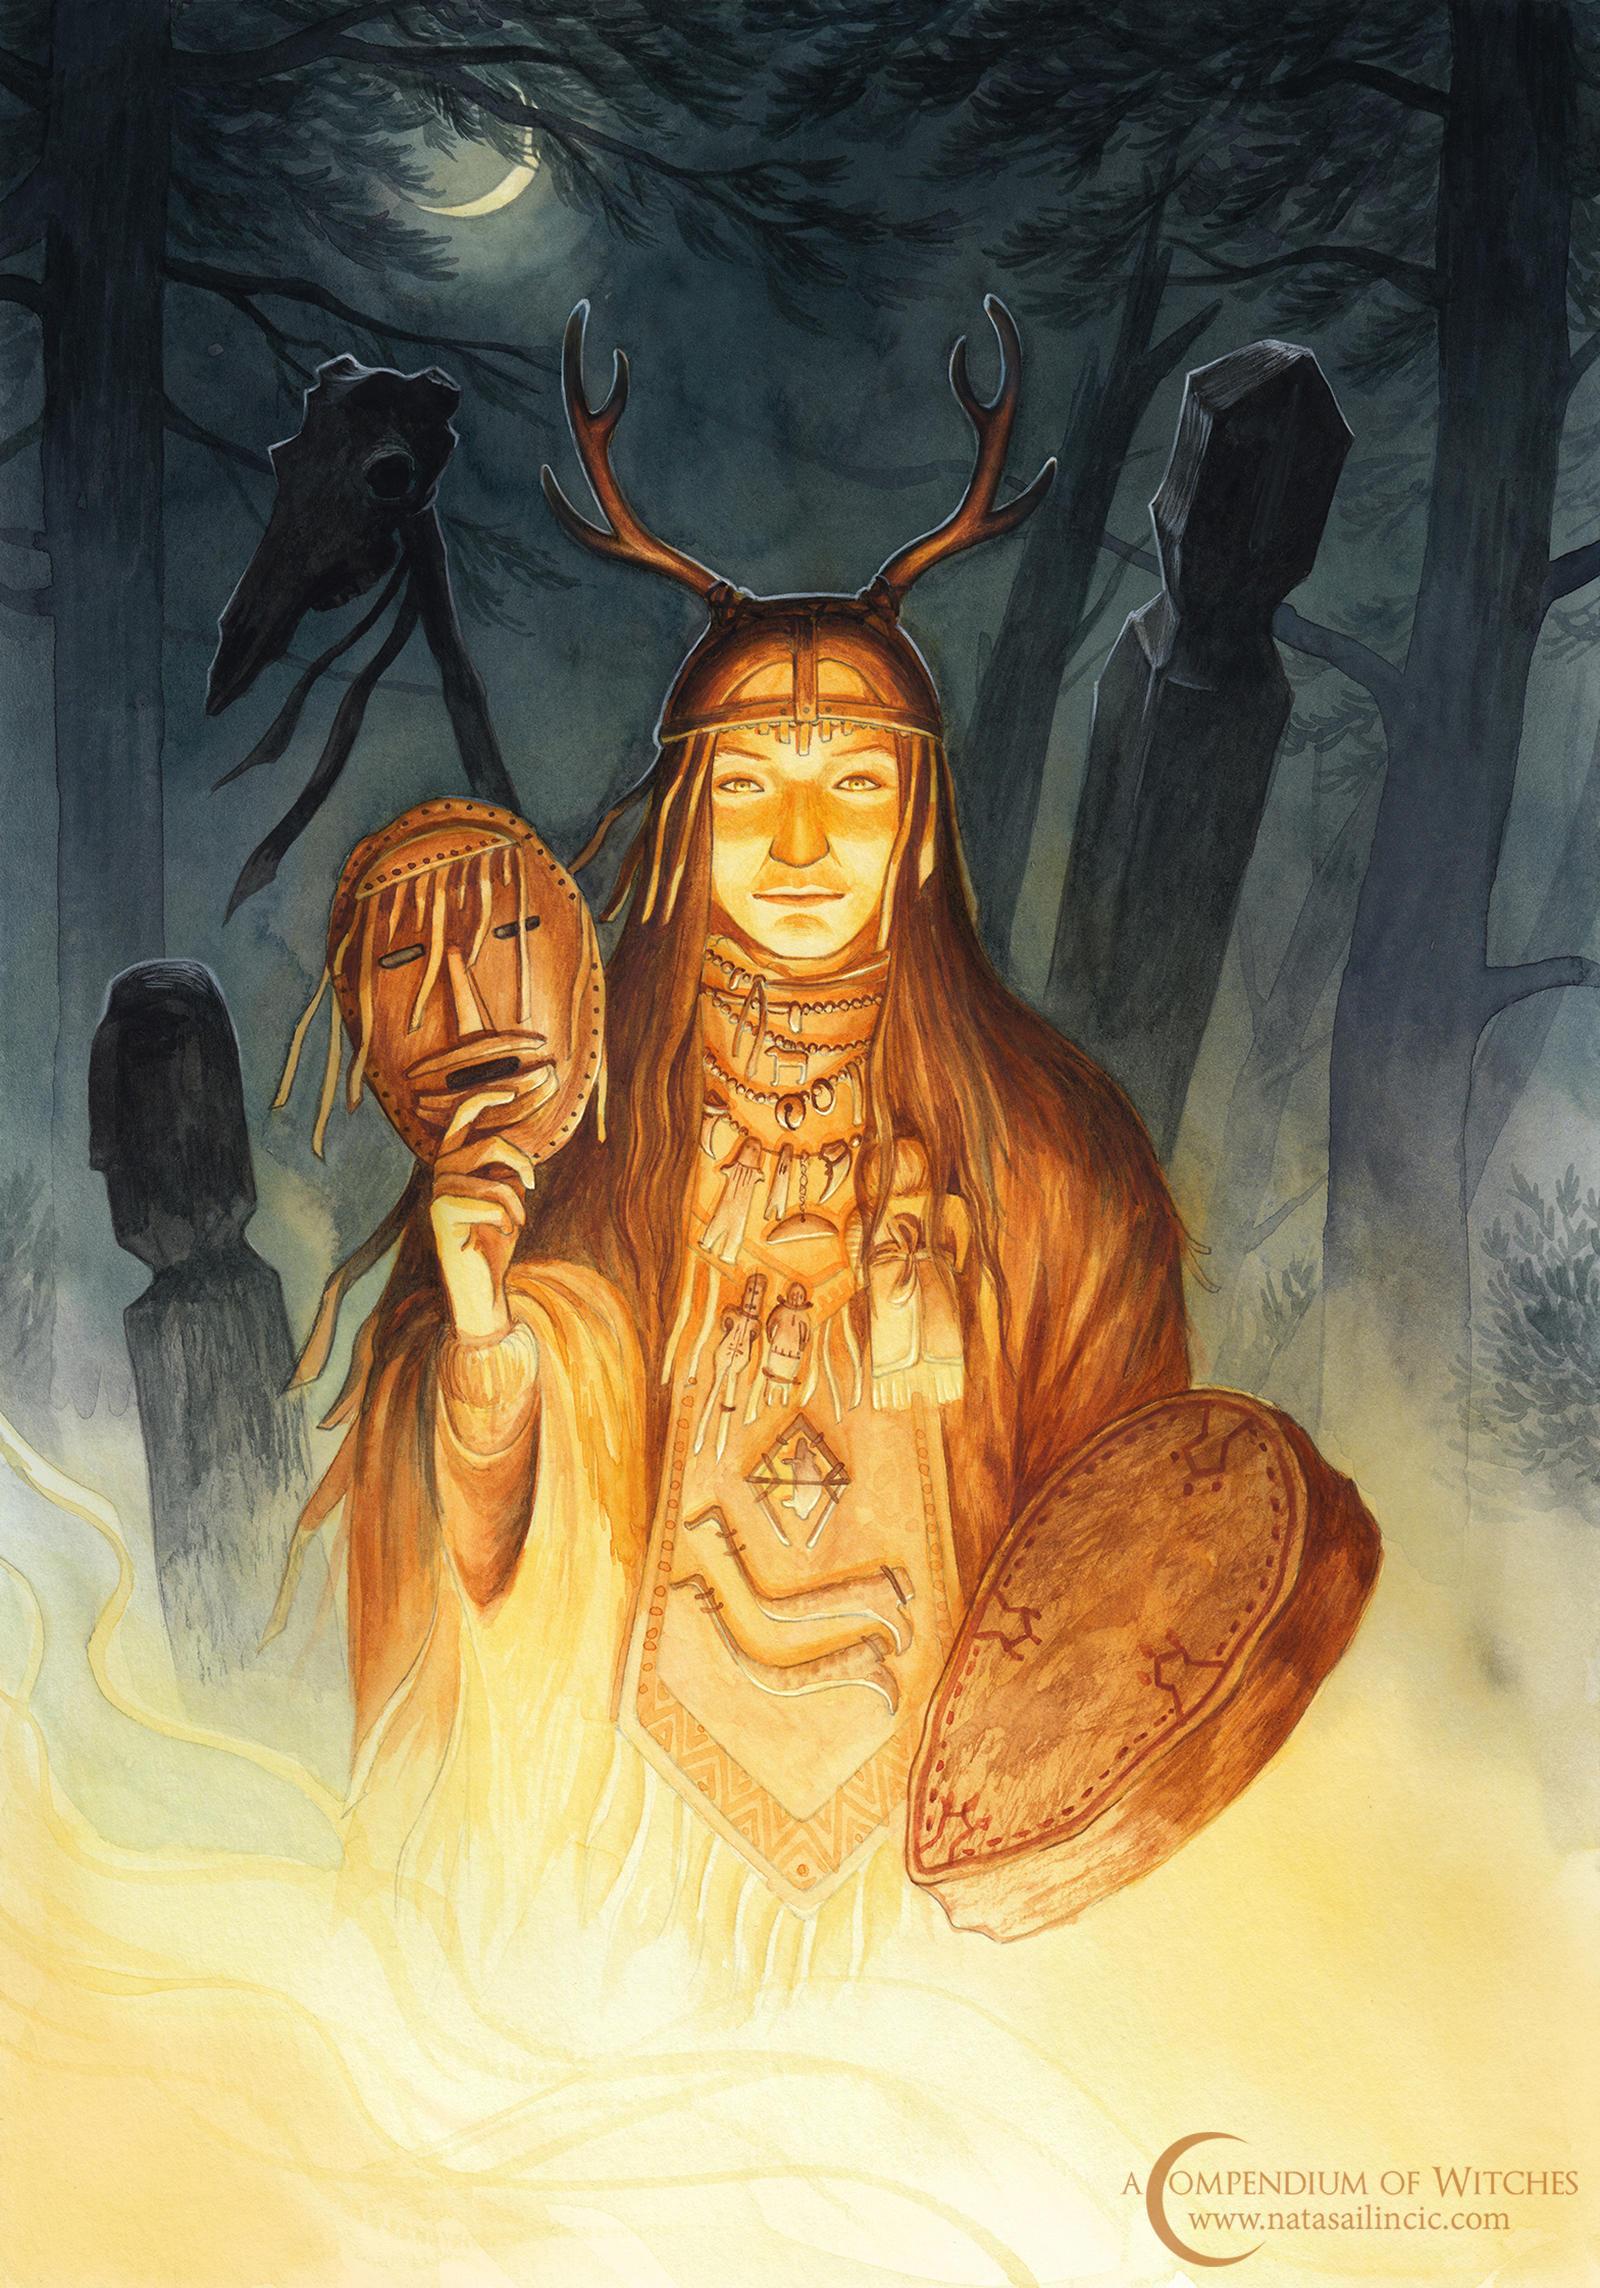 A Compendium of Witches ~ Dayaana, Siberian shaman by NatasaIlincic